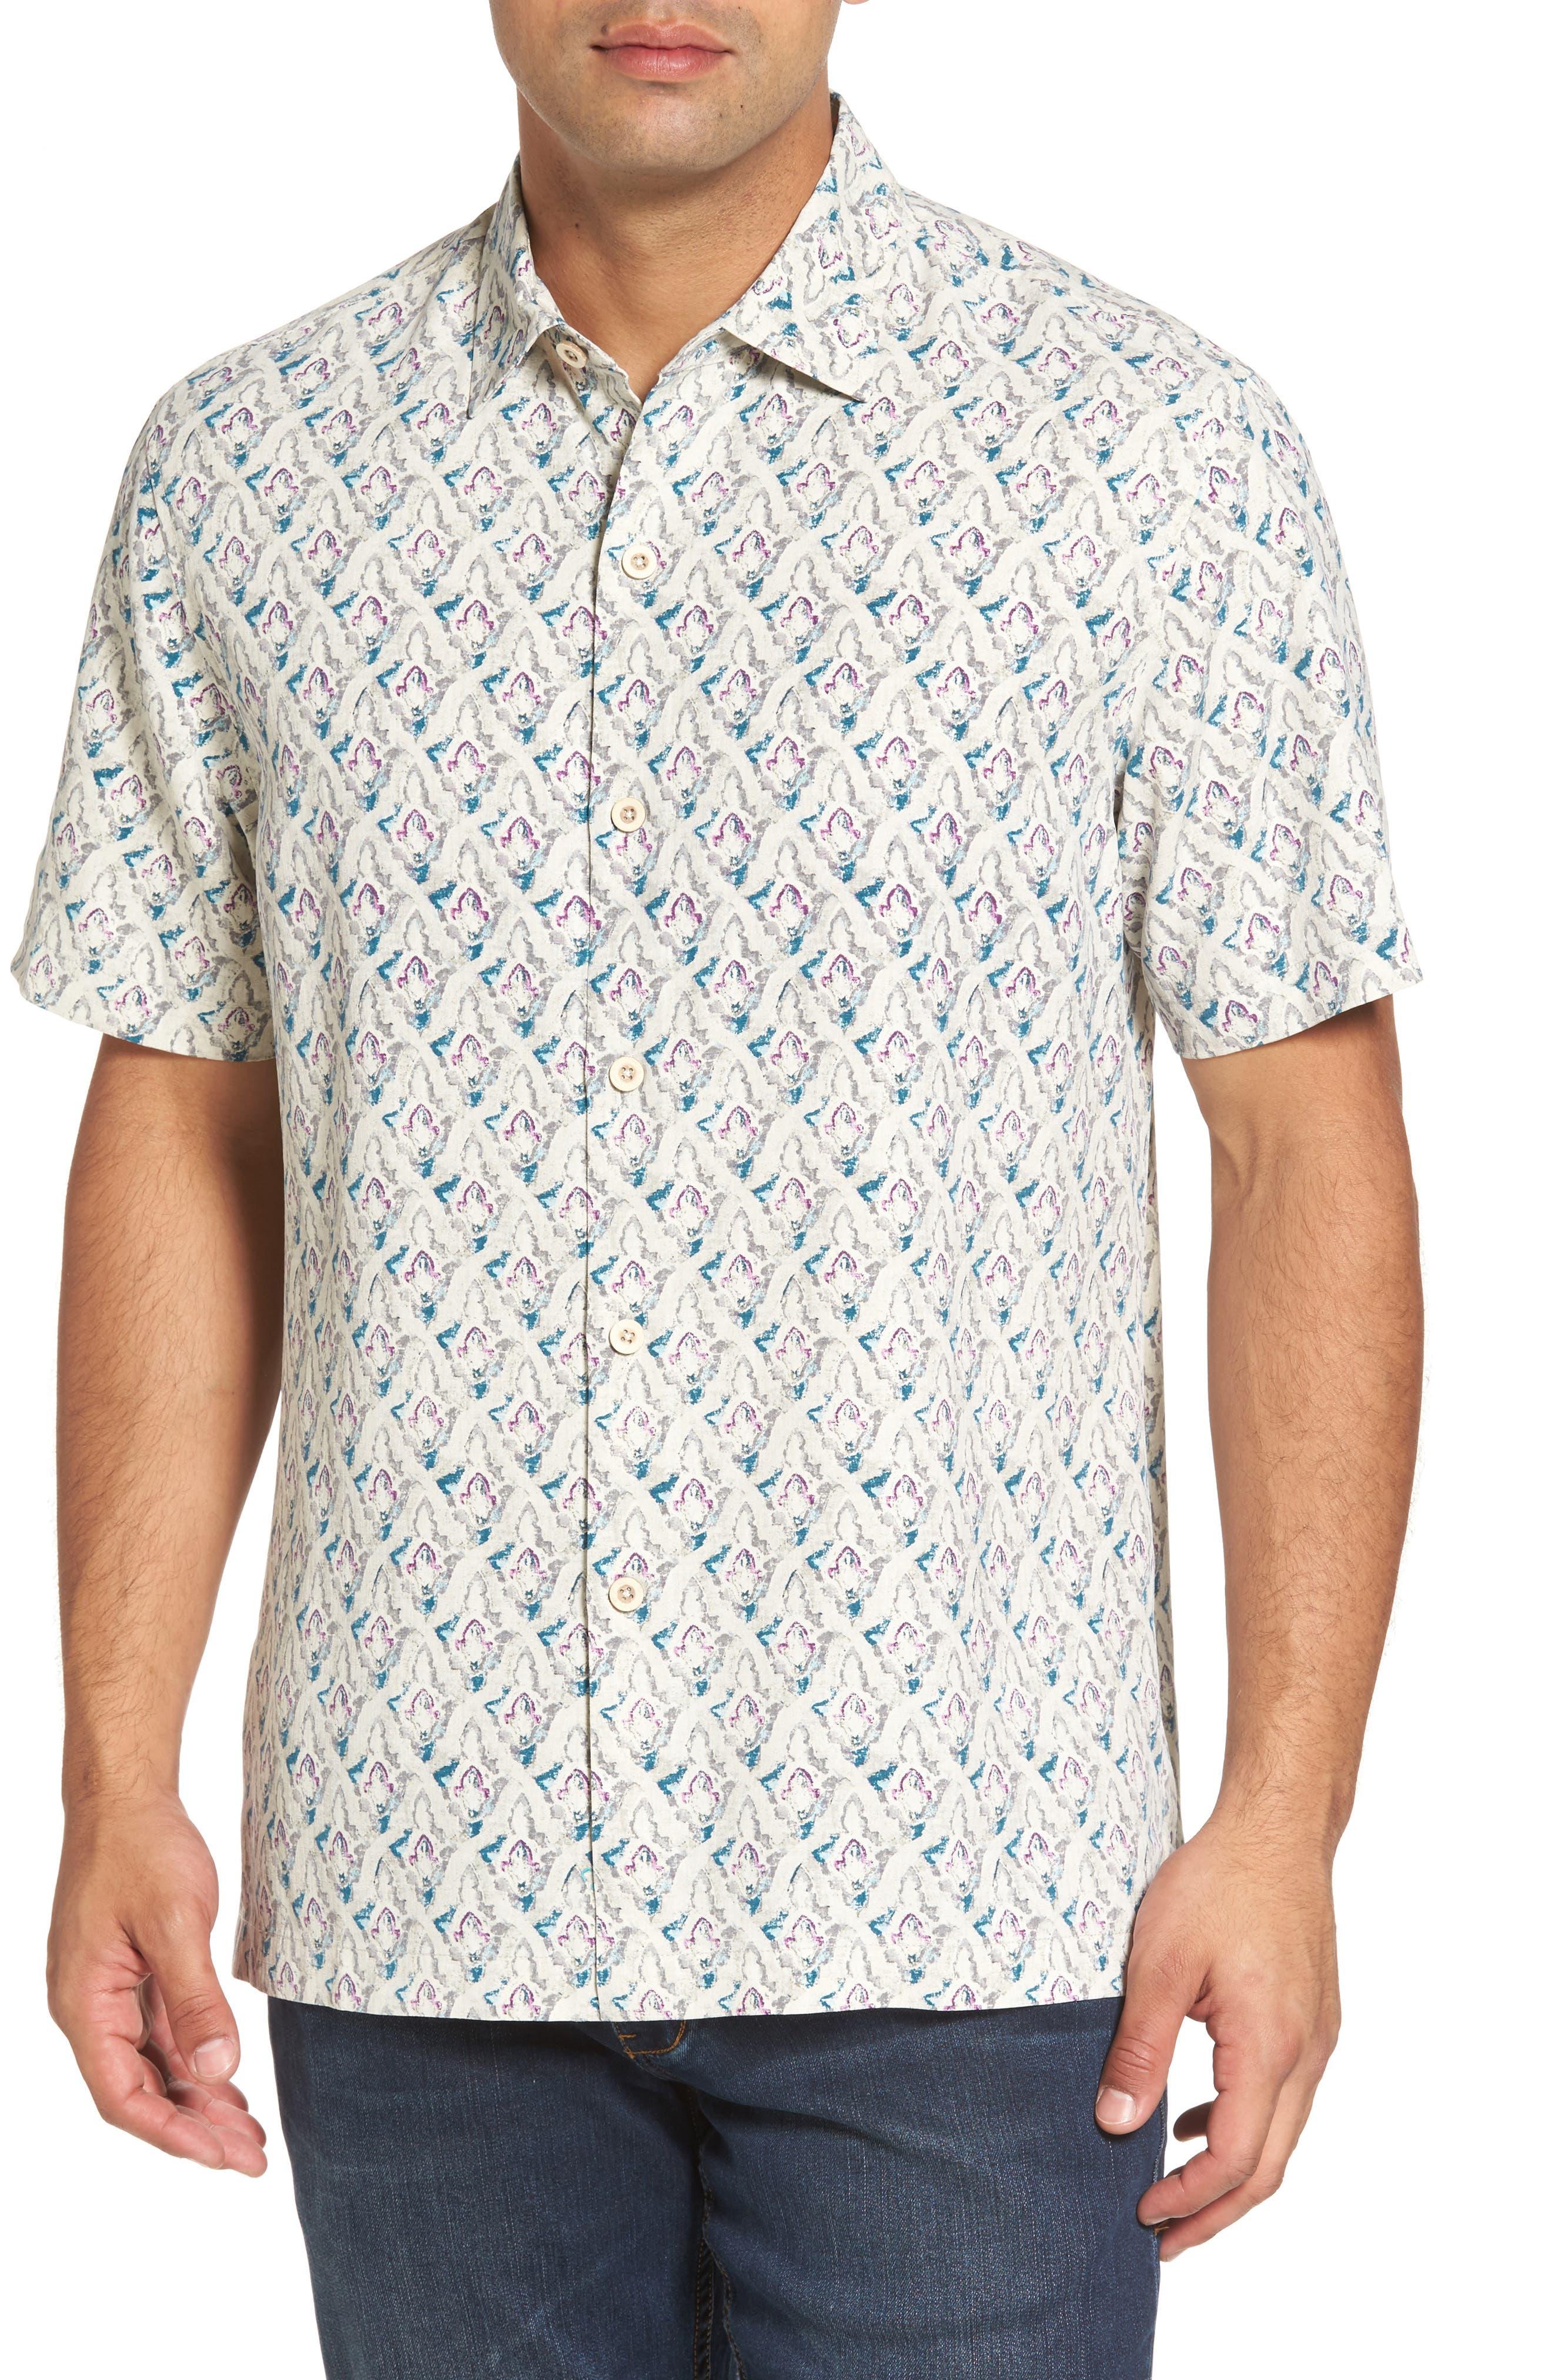 Alternate Image 1 Selected - Tommy Bahama Alcazar Tiles Standard Fit Silk Camp Shirt